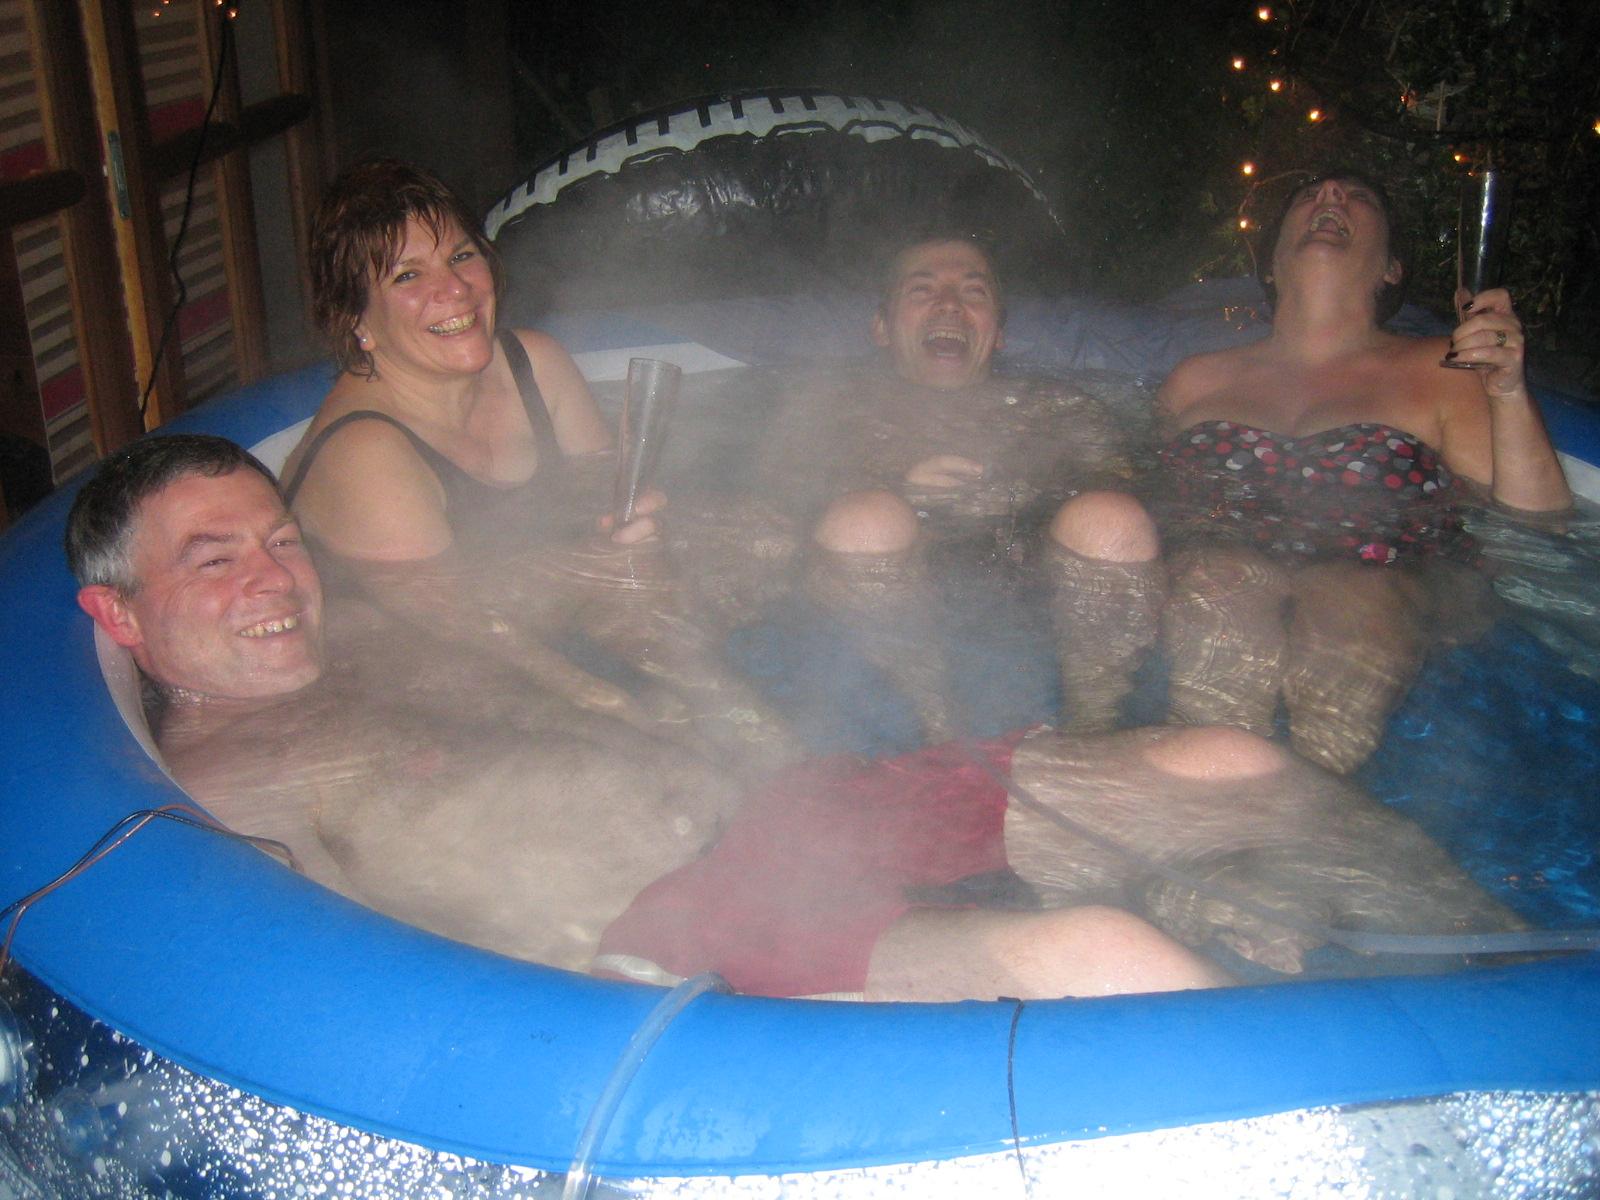 HillBilly Hot Tub